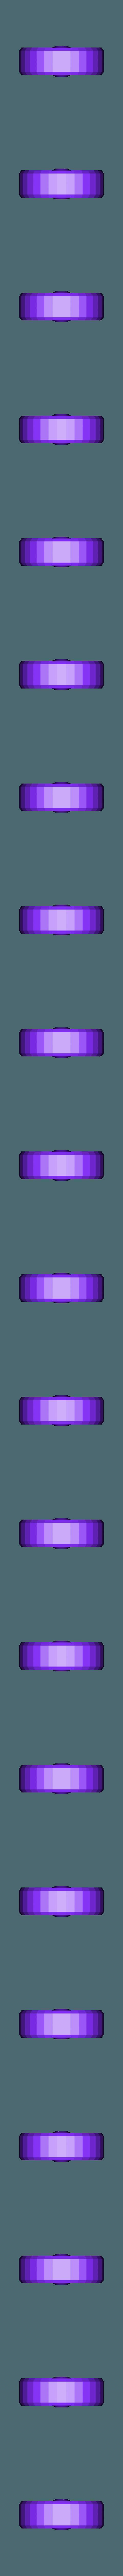 roue.STL Download STL file Caravan 3Places • 3D printable model, dede34500